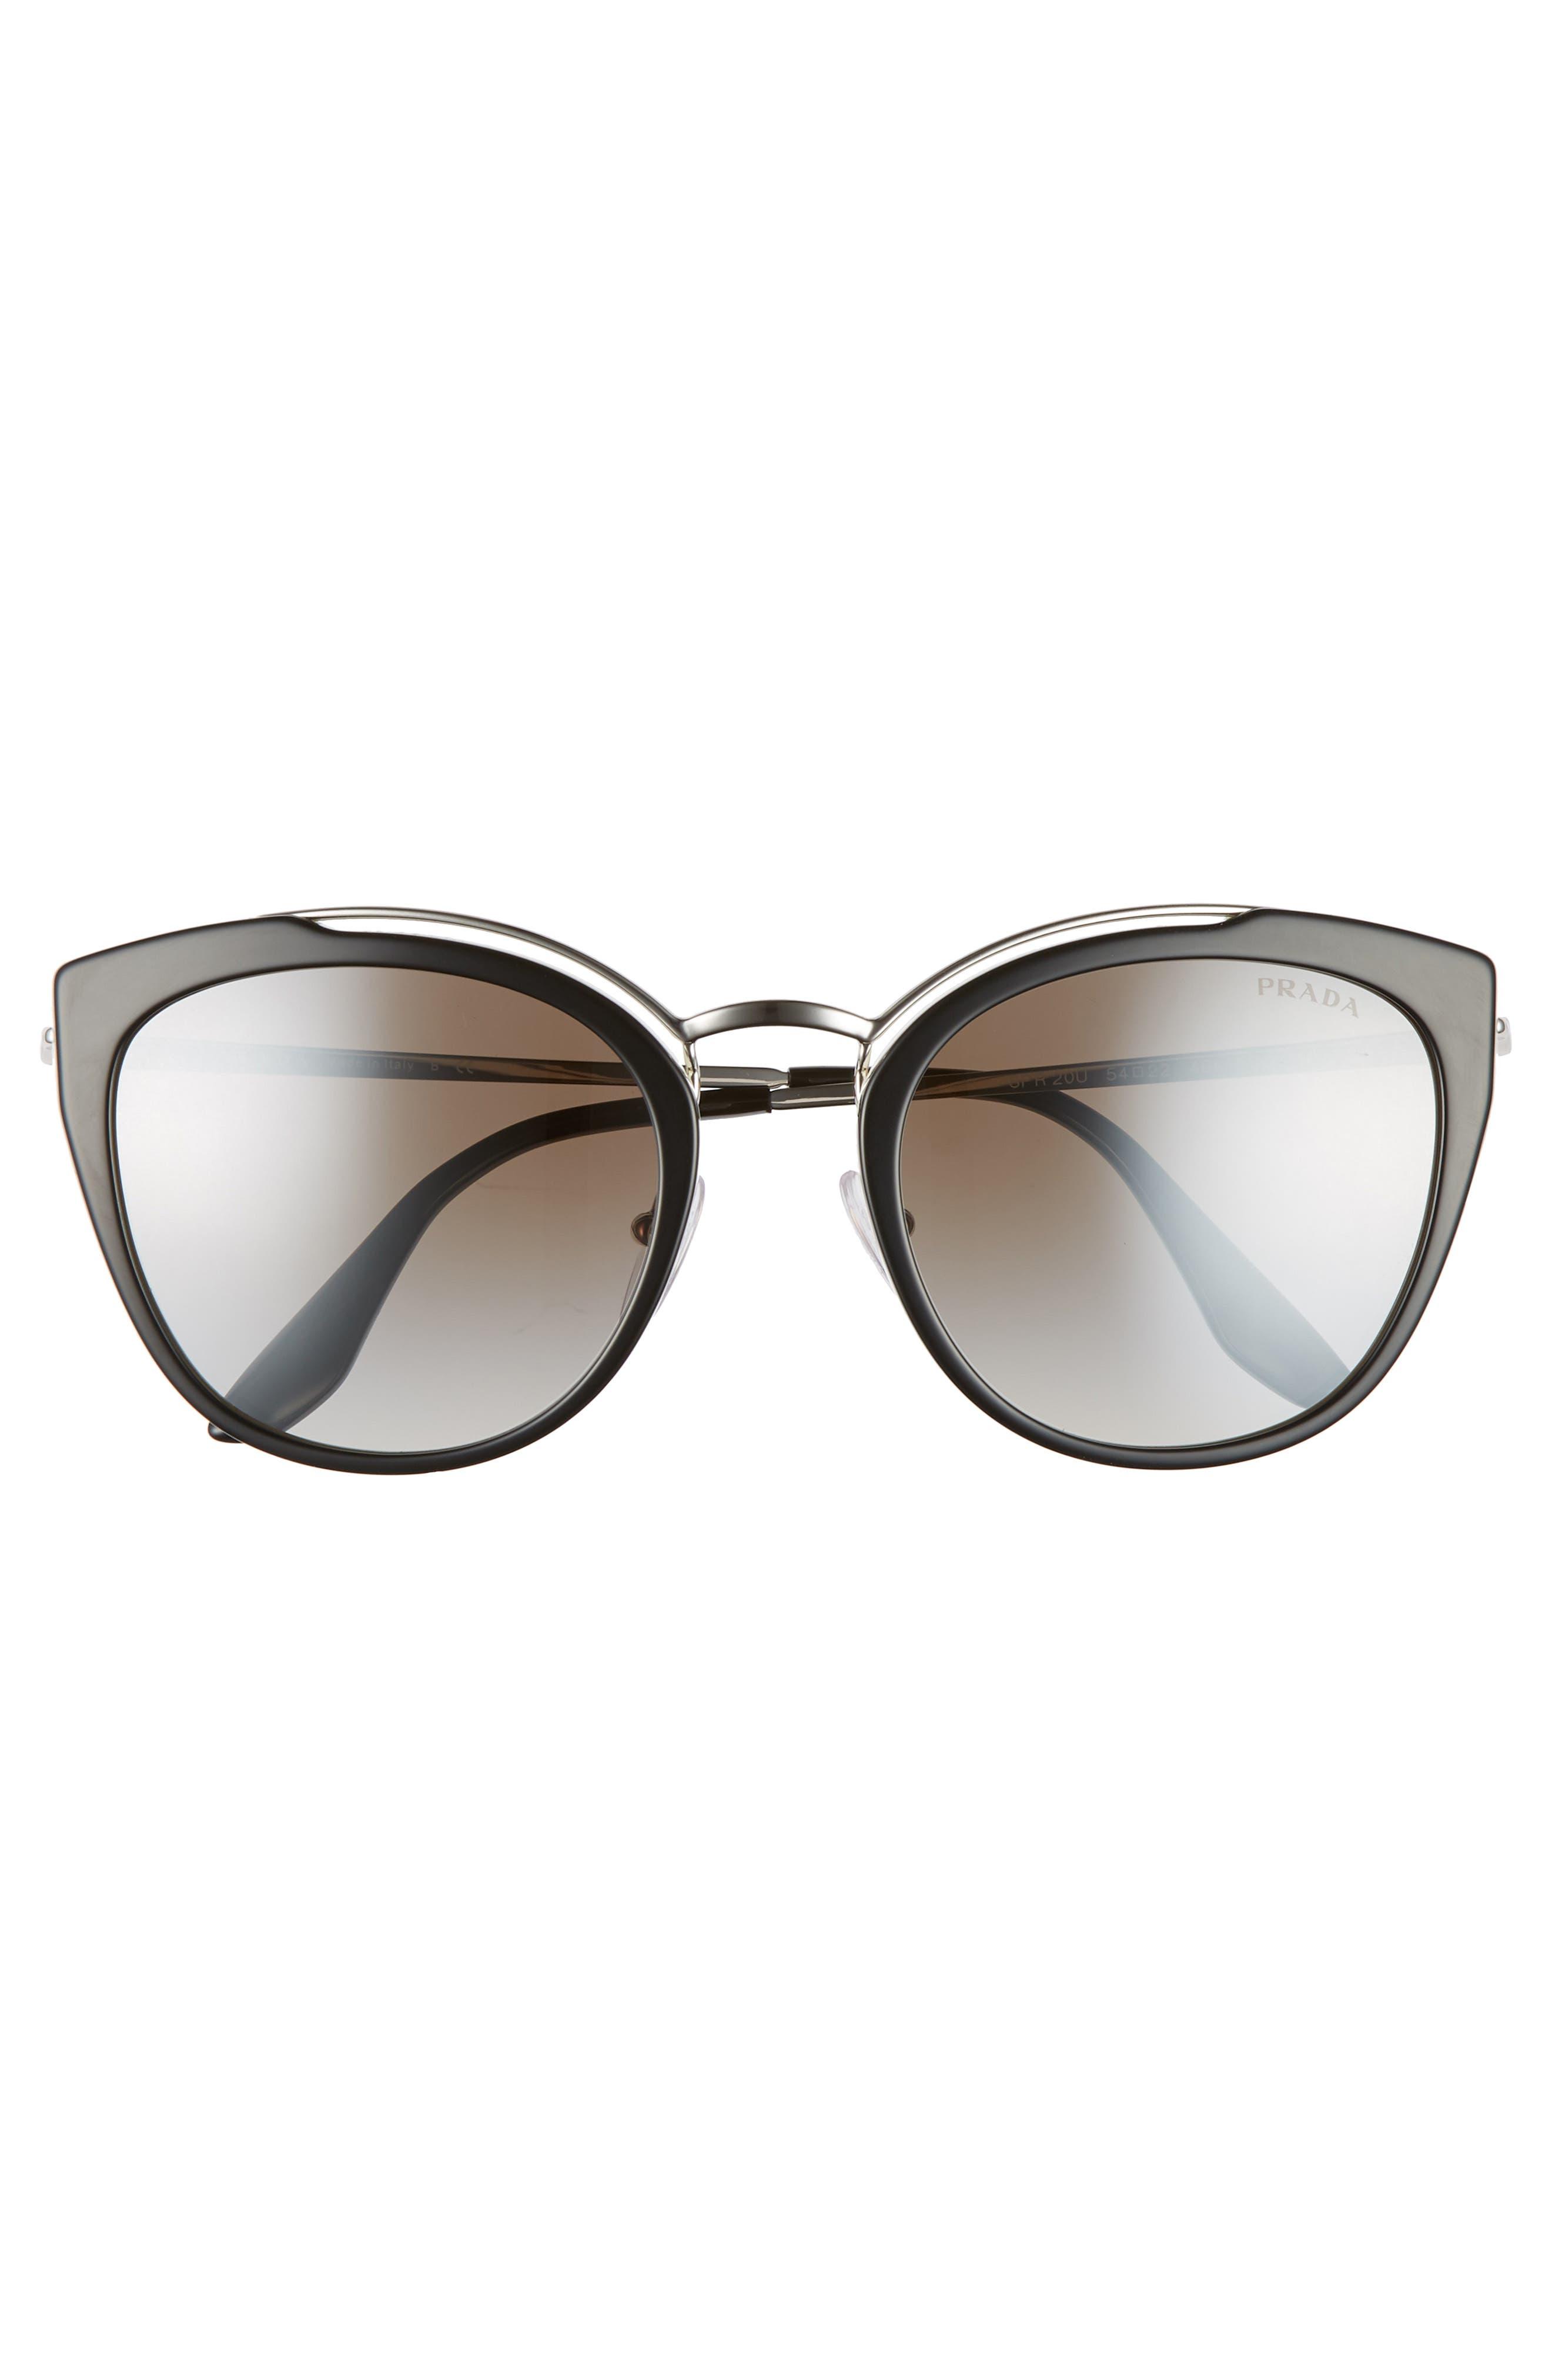 PRADA,                             54mm Gradient Cat Eye Sunglasses,                             Alternate thumbnail 3, color,                             BLACK/ SILVER GRADIENT MIRROR